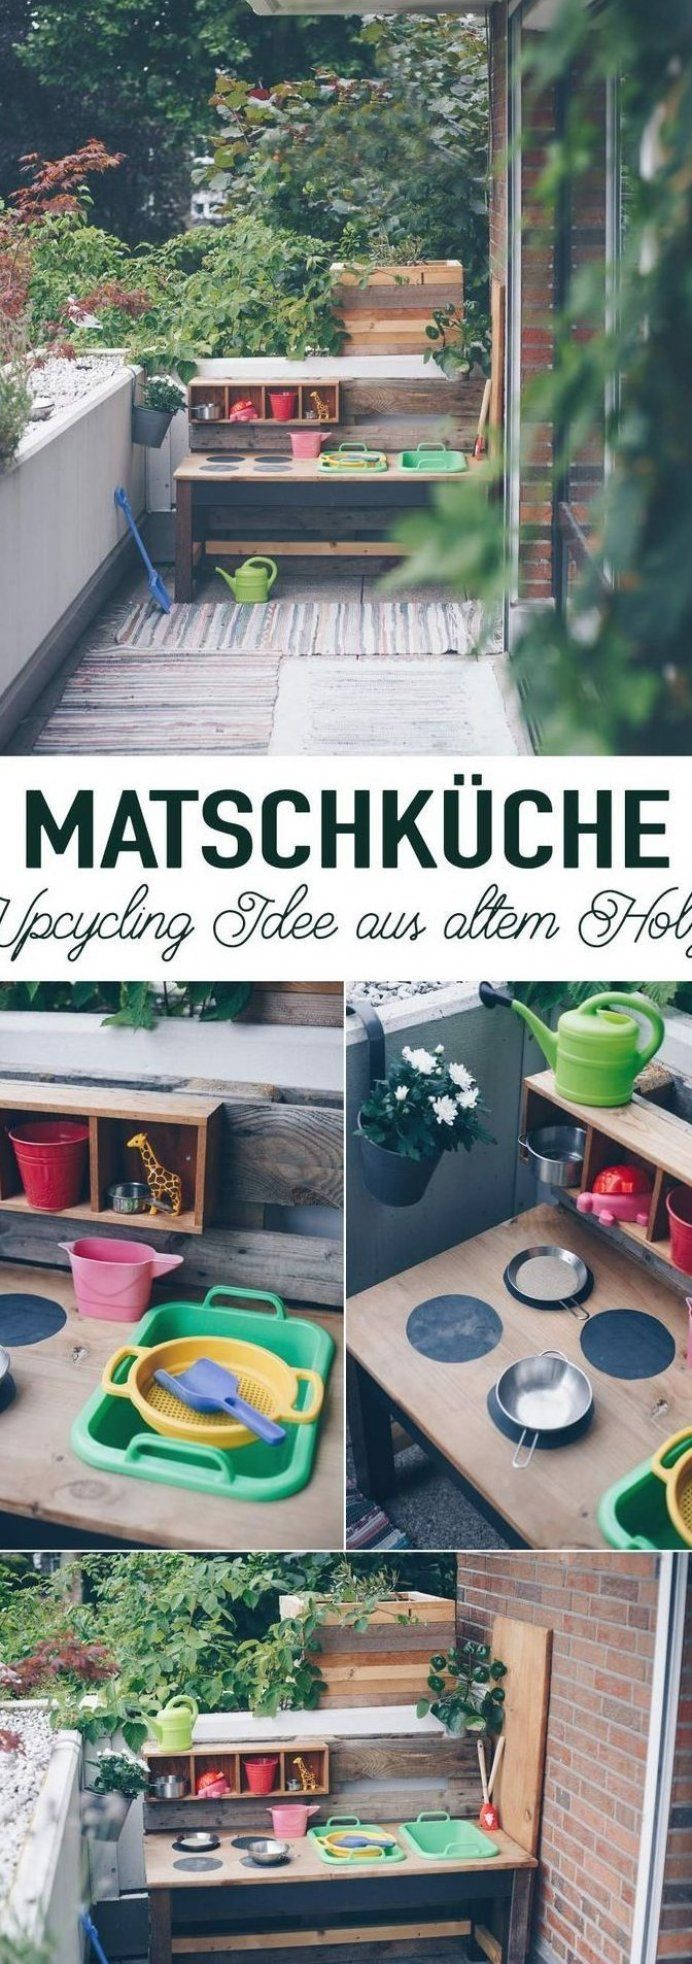 DIY Matschk che selber bauen - DIY f r Kinder - Upcycling ...